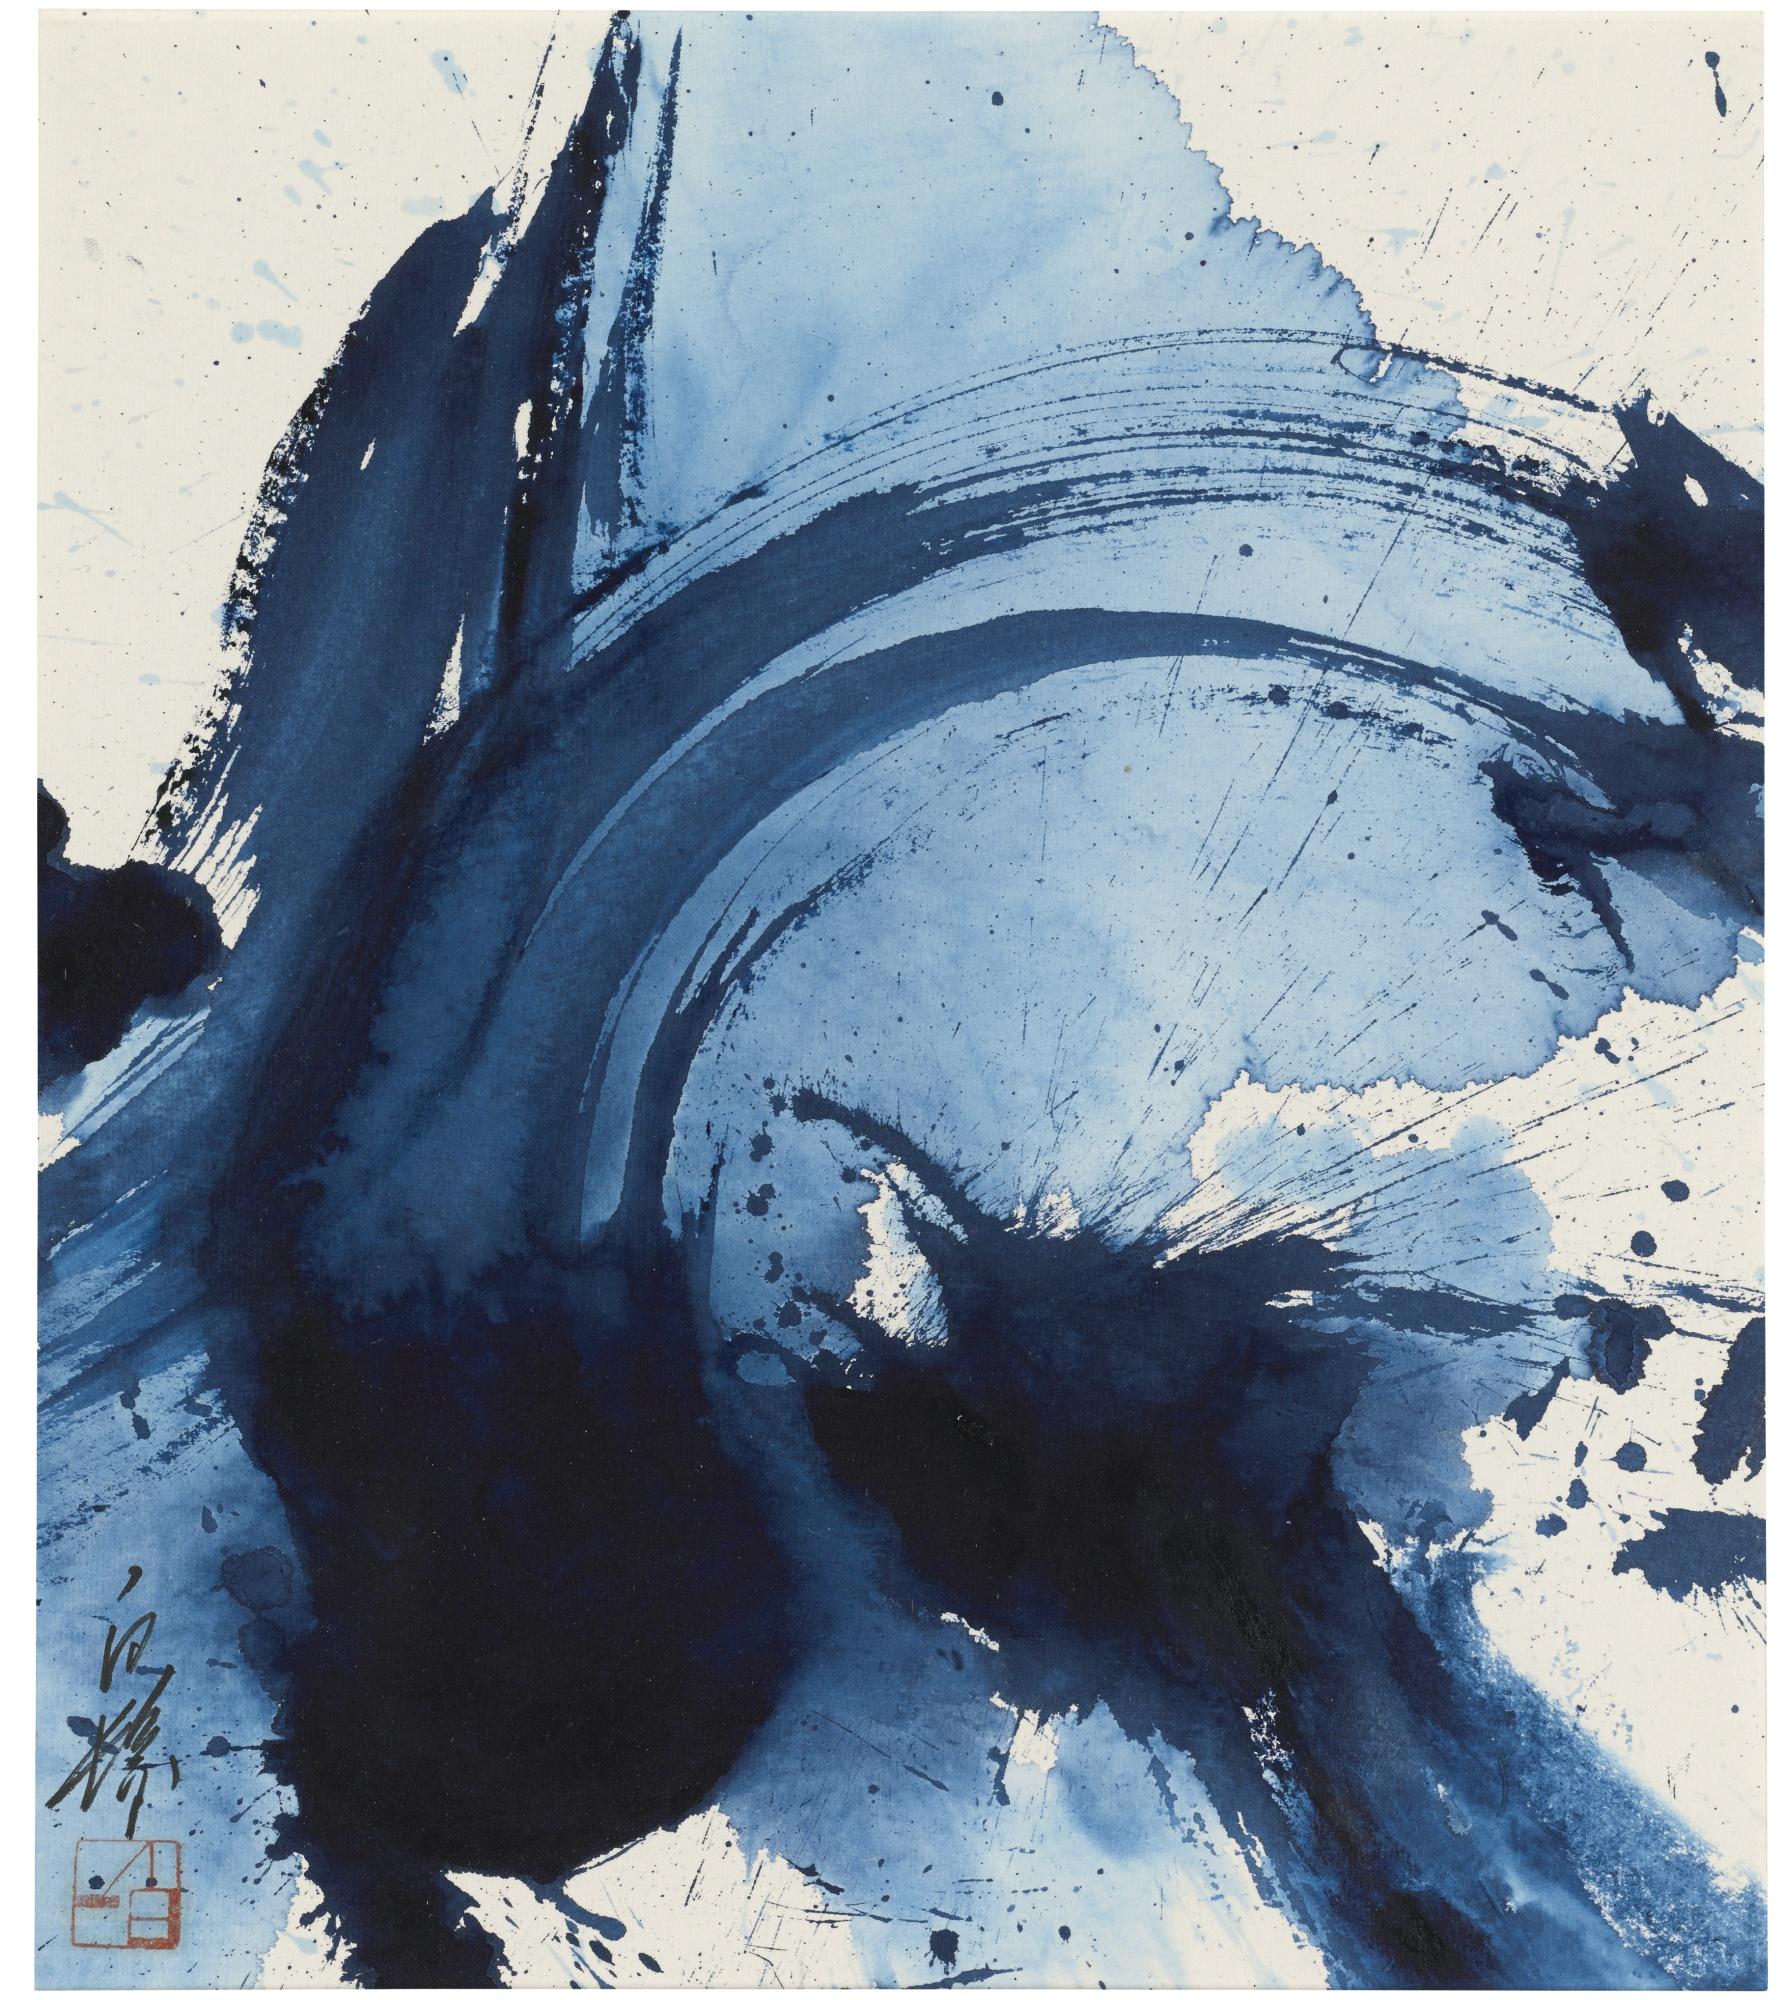 Kazuo Shiraga-Prussian Blue-1977